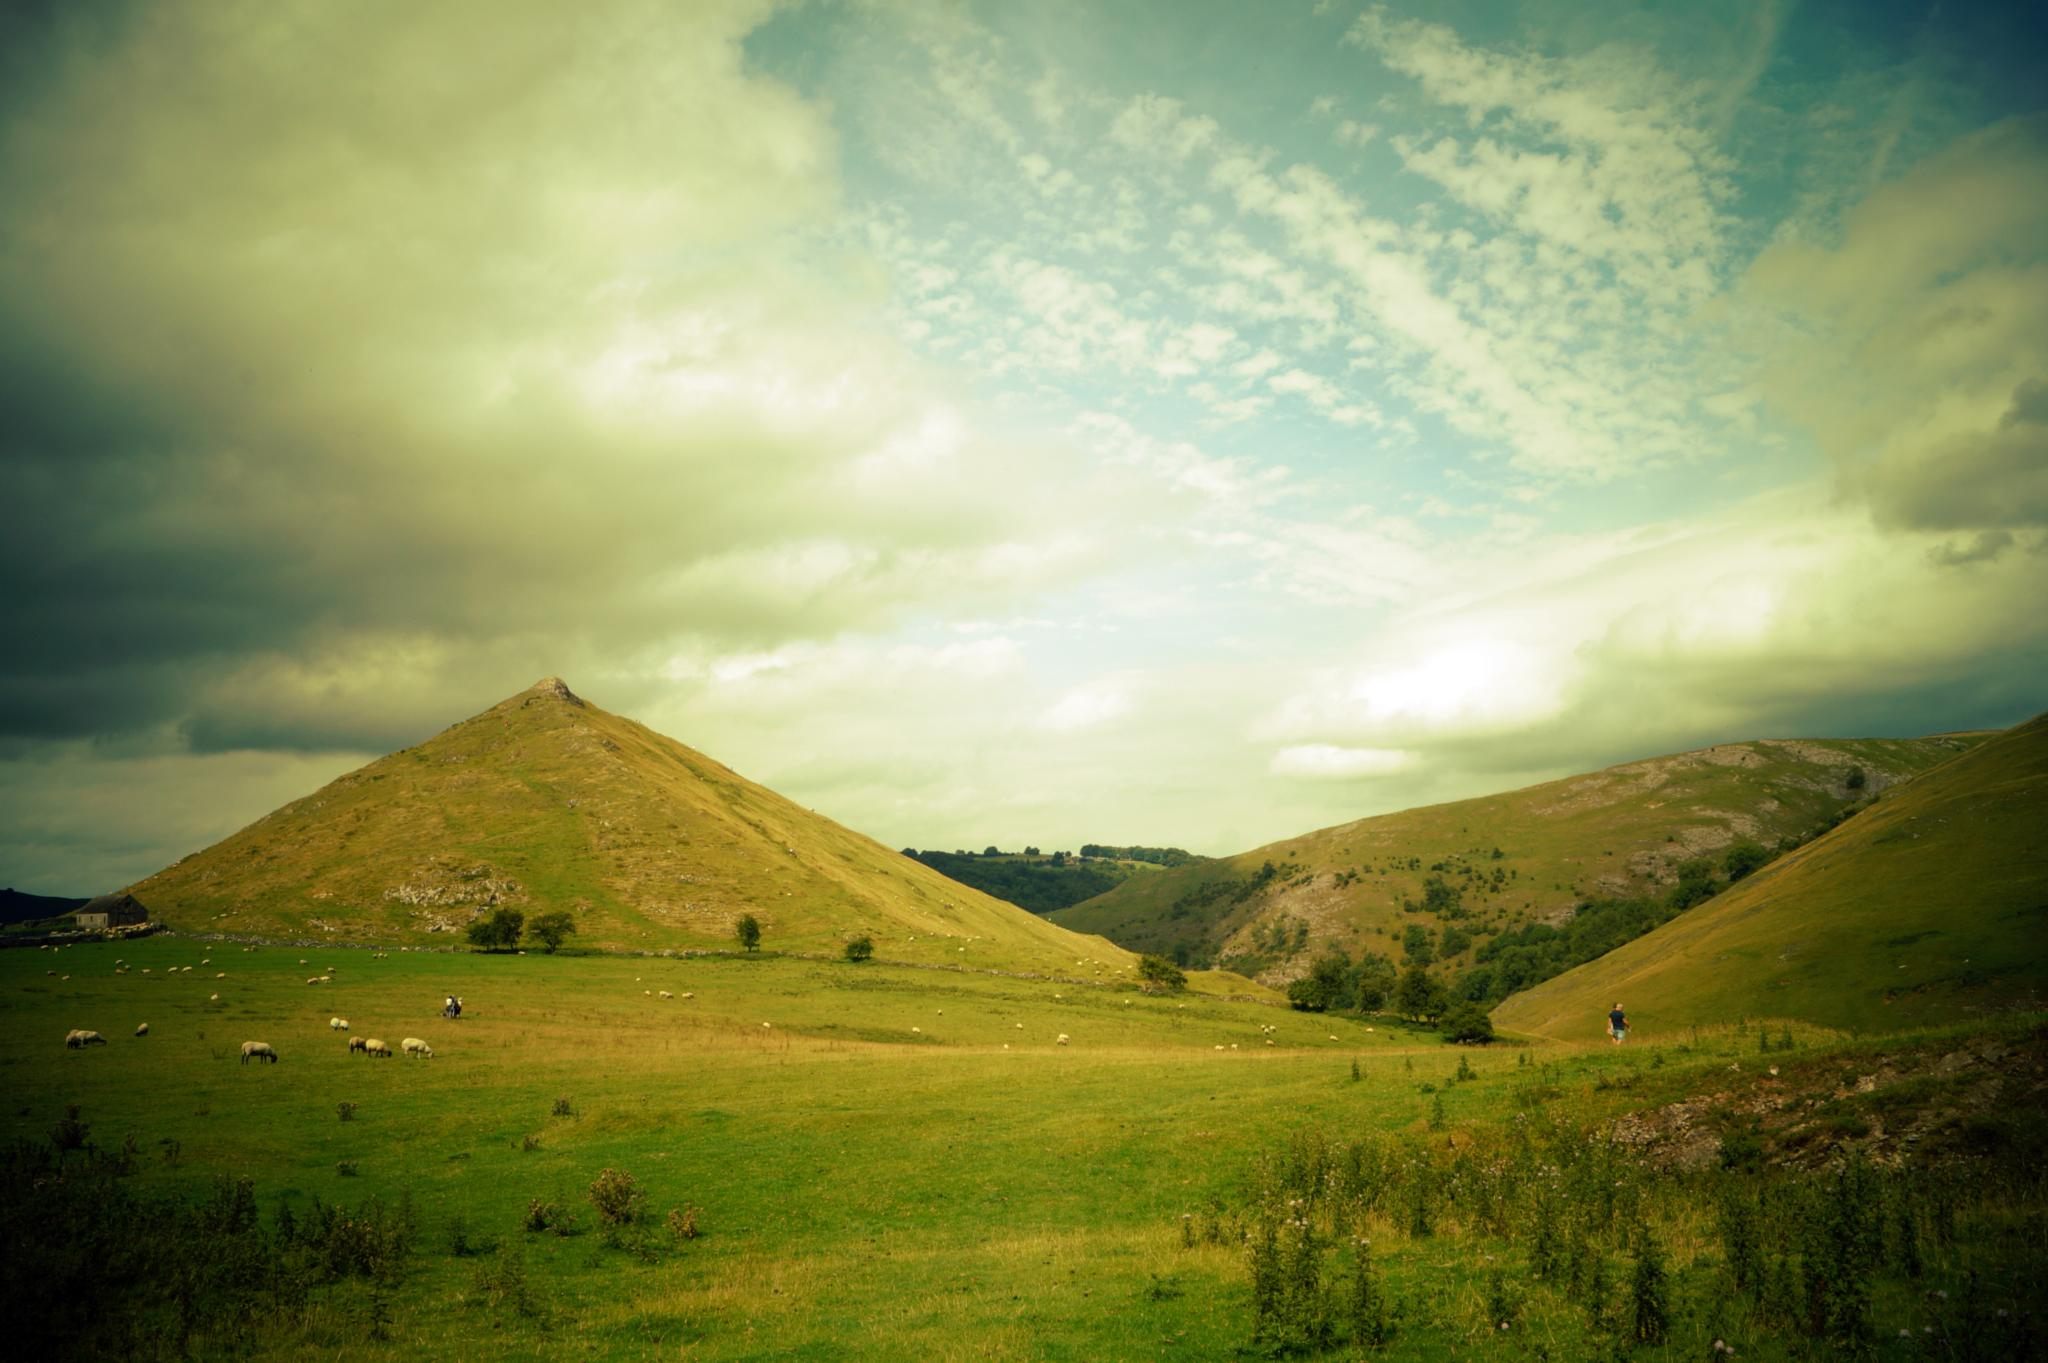 Thorpe Cloud by imurfin